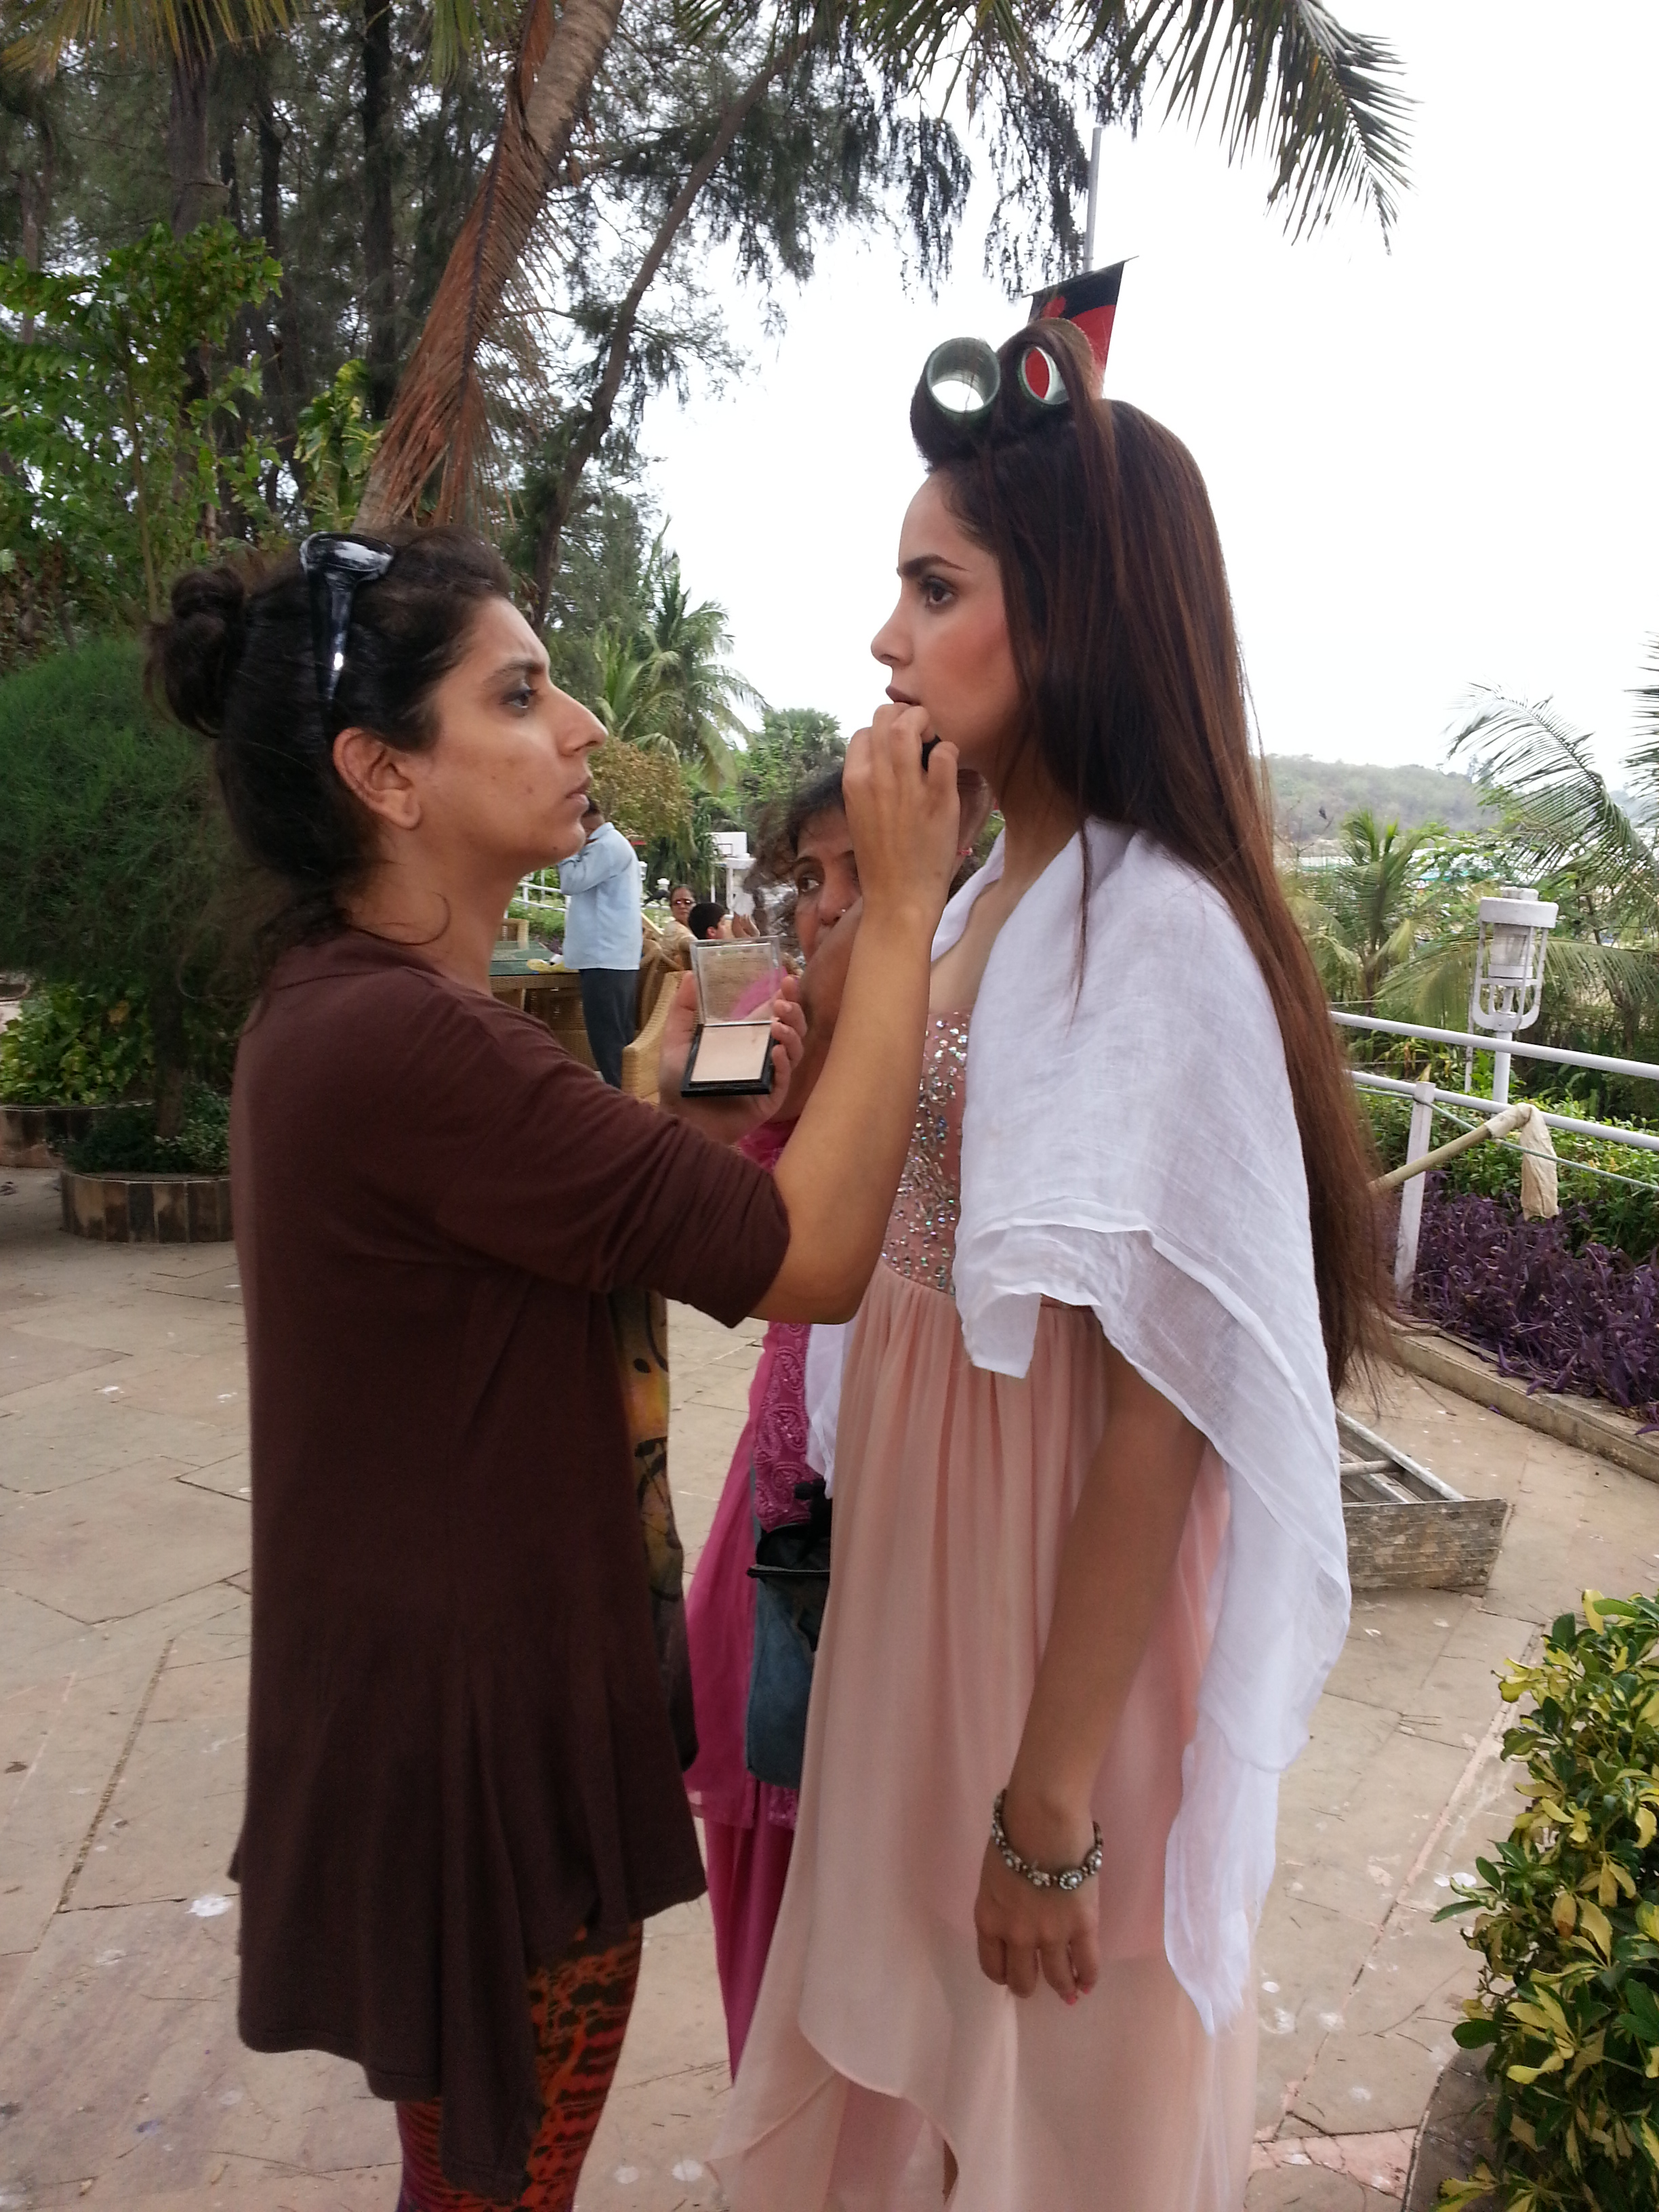 Shazan Padamsee for Ketomac Shampoo